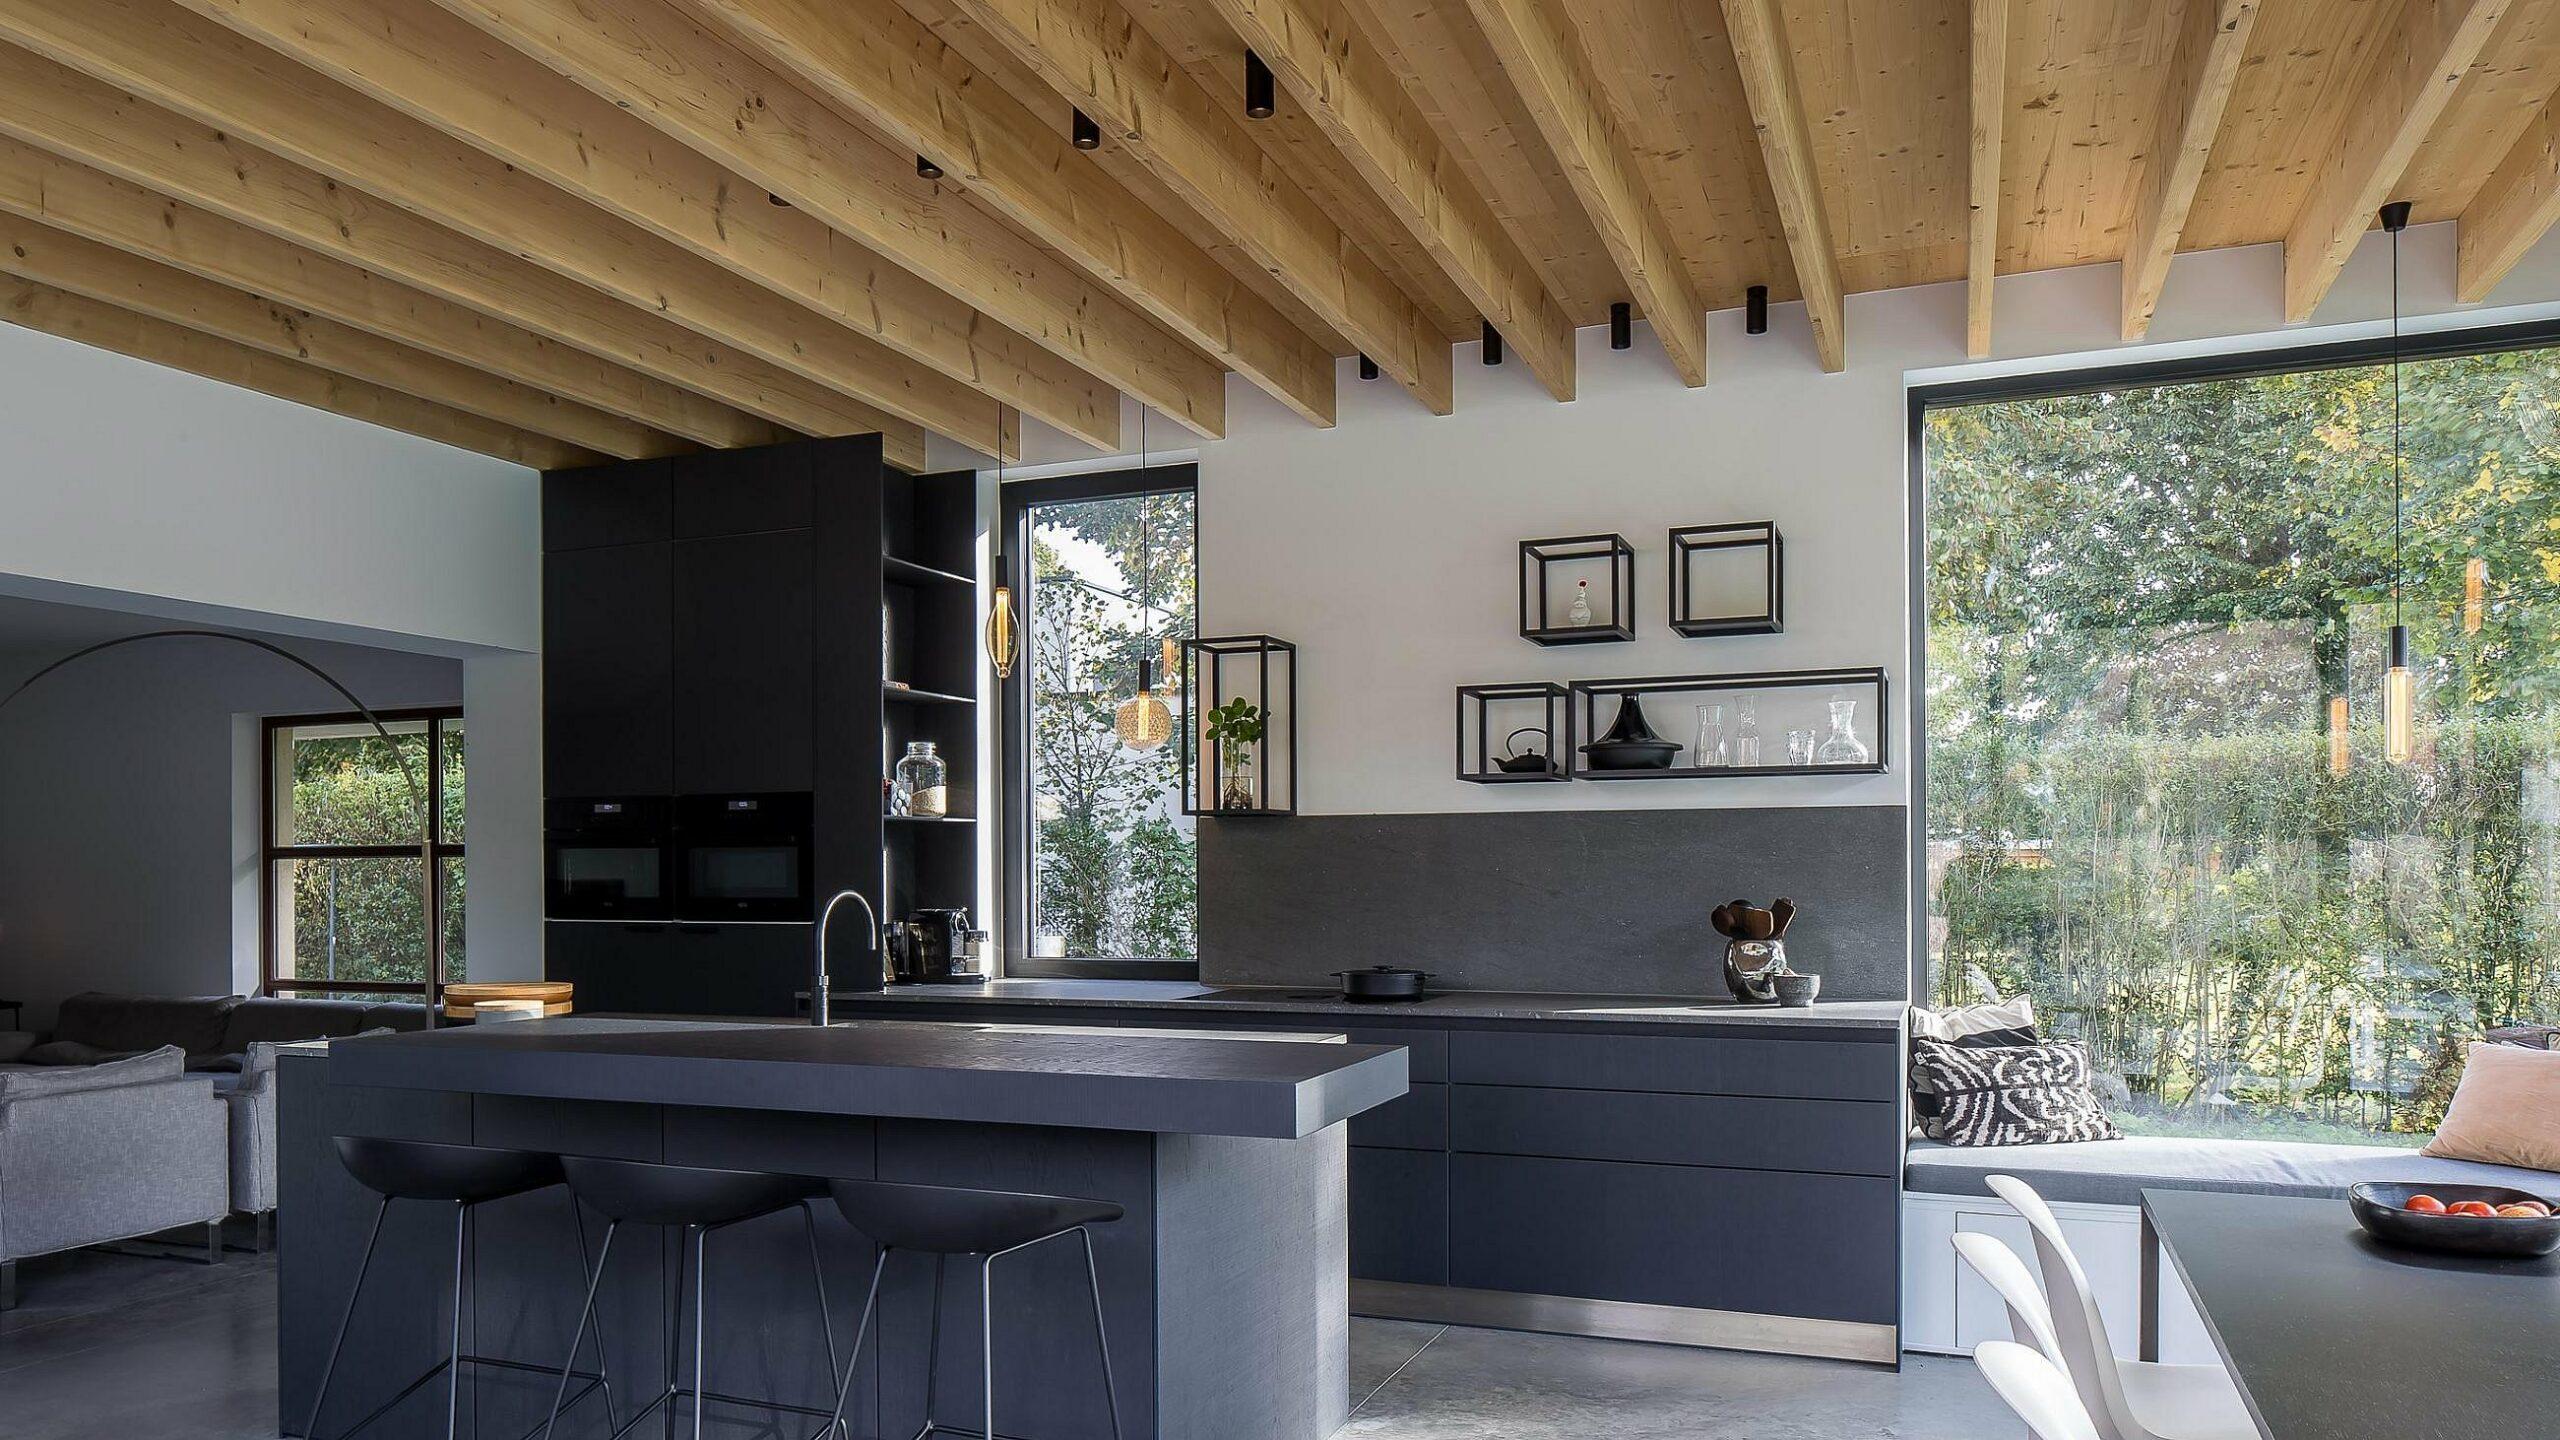 csm bulthaup ligna recta cafeine black oak 11 6588962077 scaled | Baeyens & Beck architecten Gent | architect nieuwbouw renovatie interieur | high end | architectenbureau